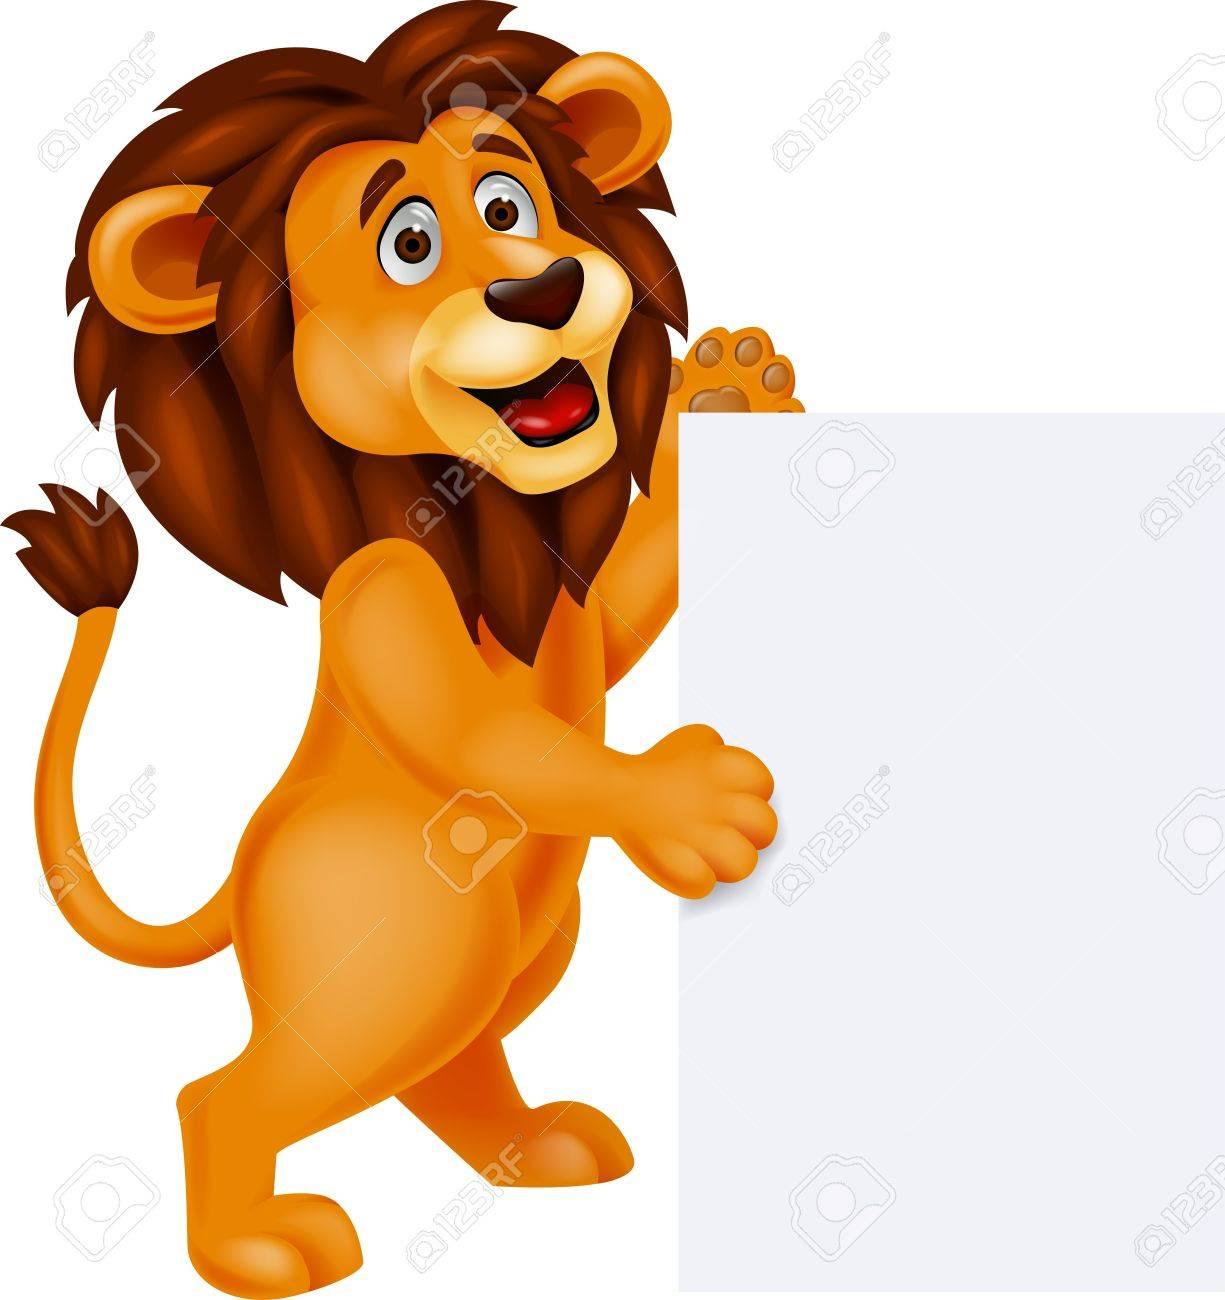 Lion cartoon with blank sign Stock Vector - 17140364